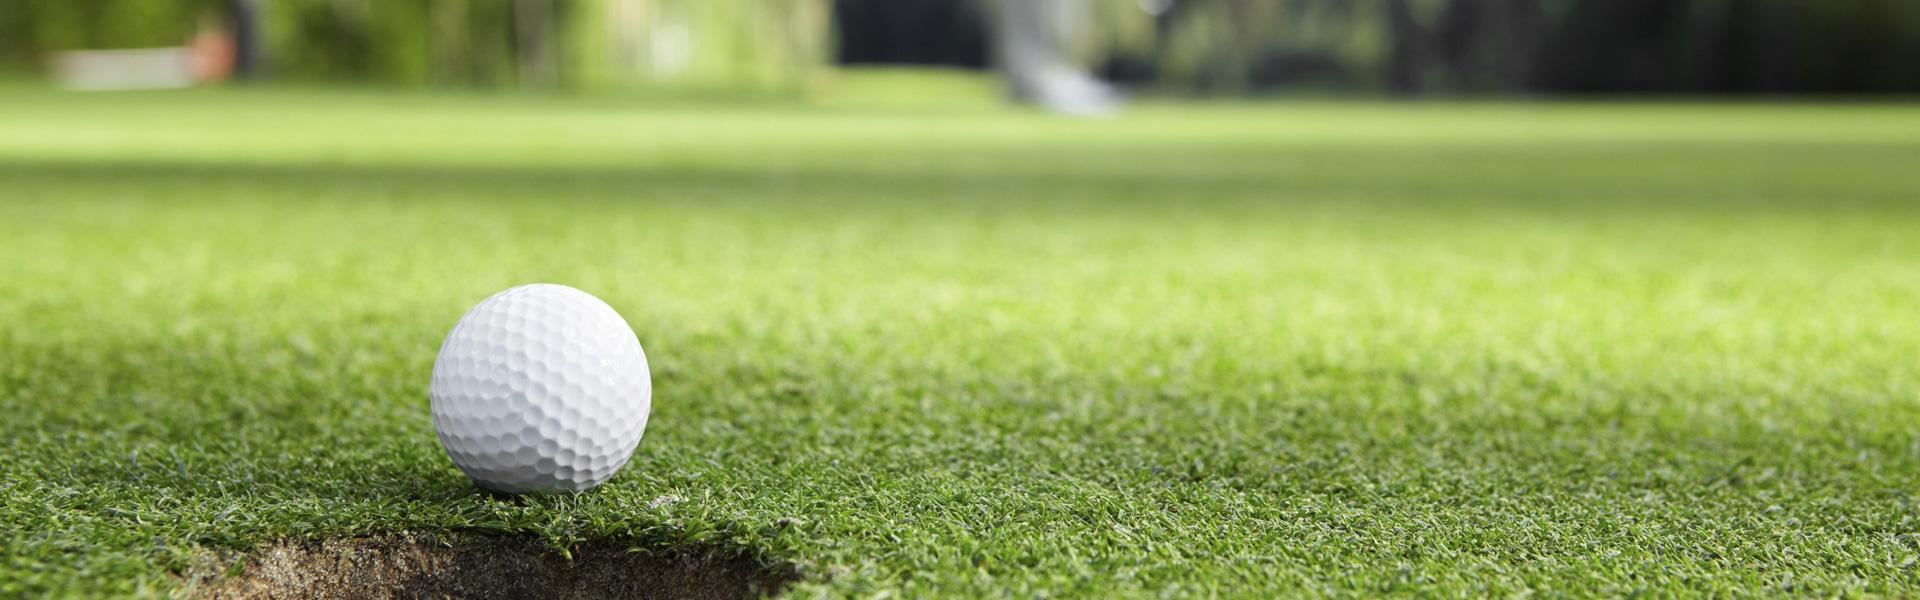 Césped artificial para el golf